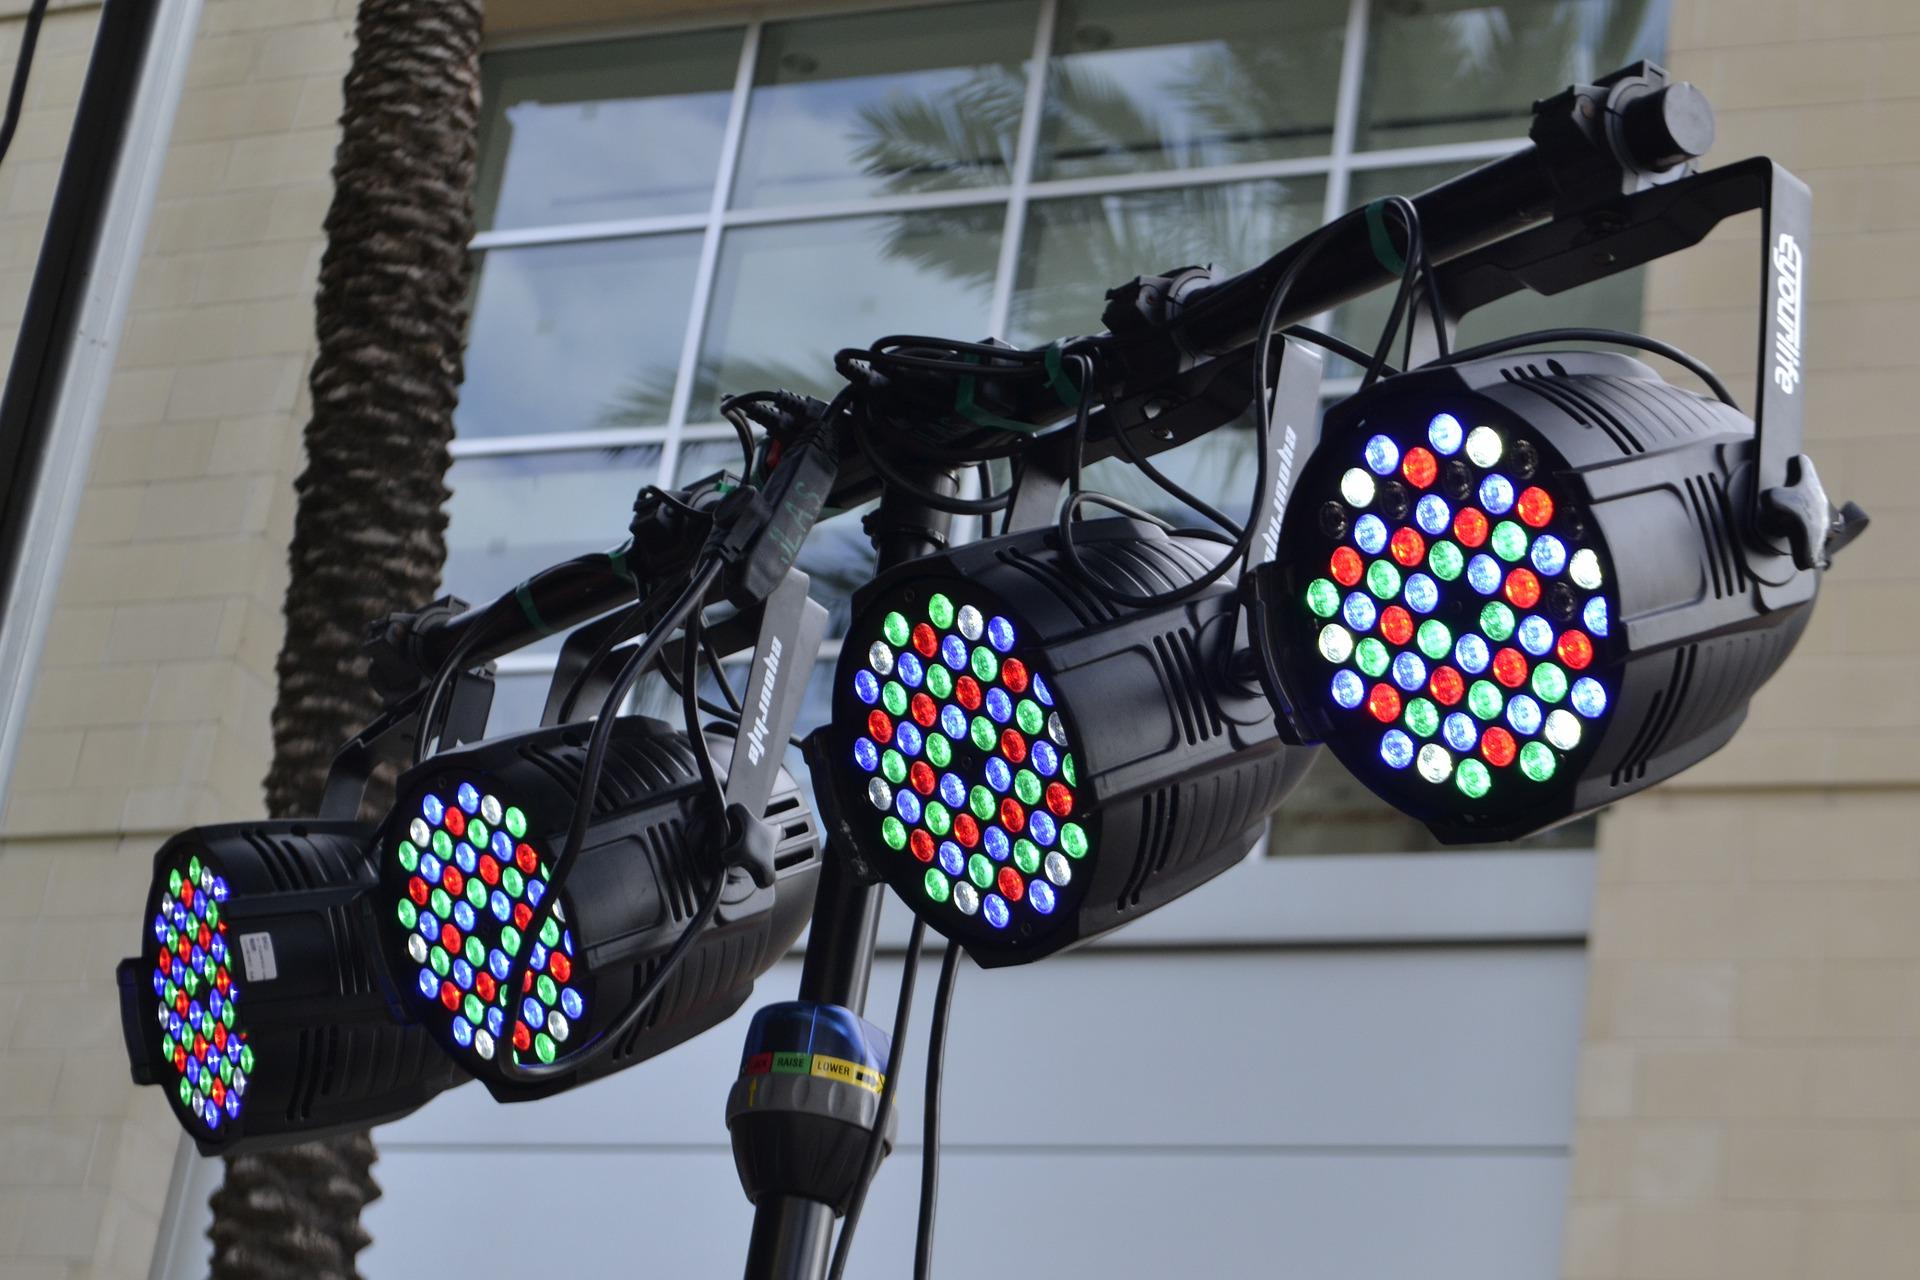 stage-lights-4684900_1920